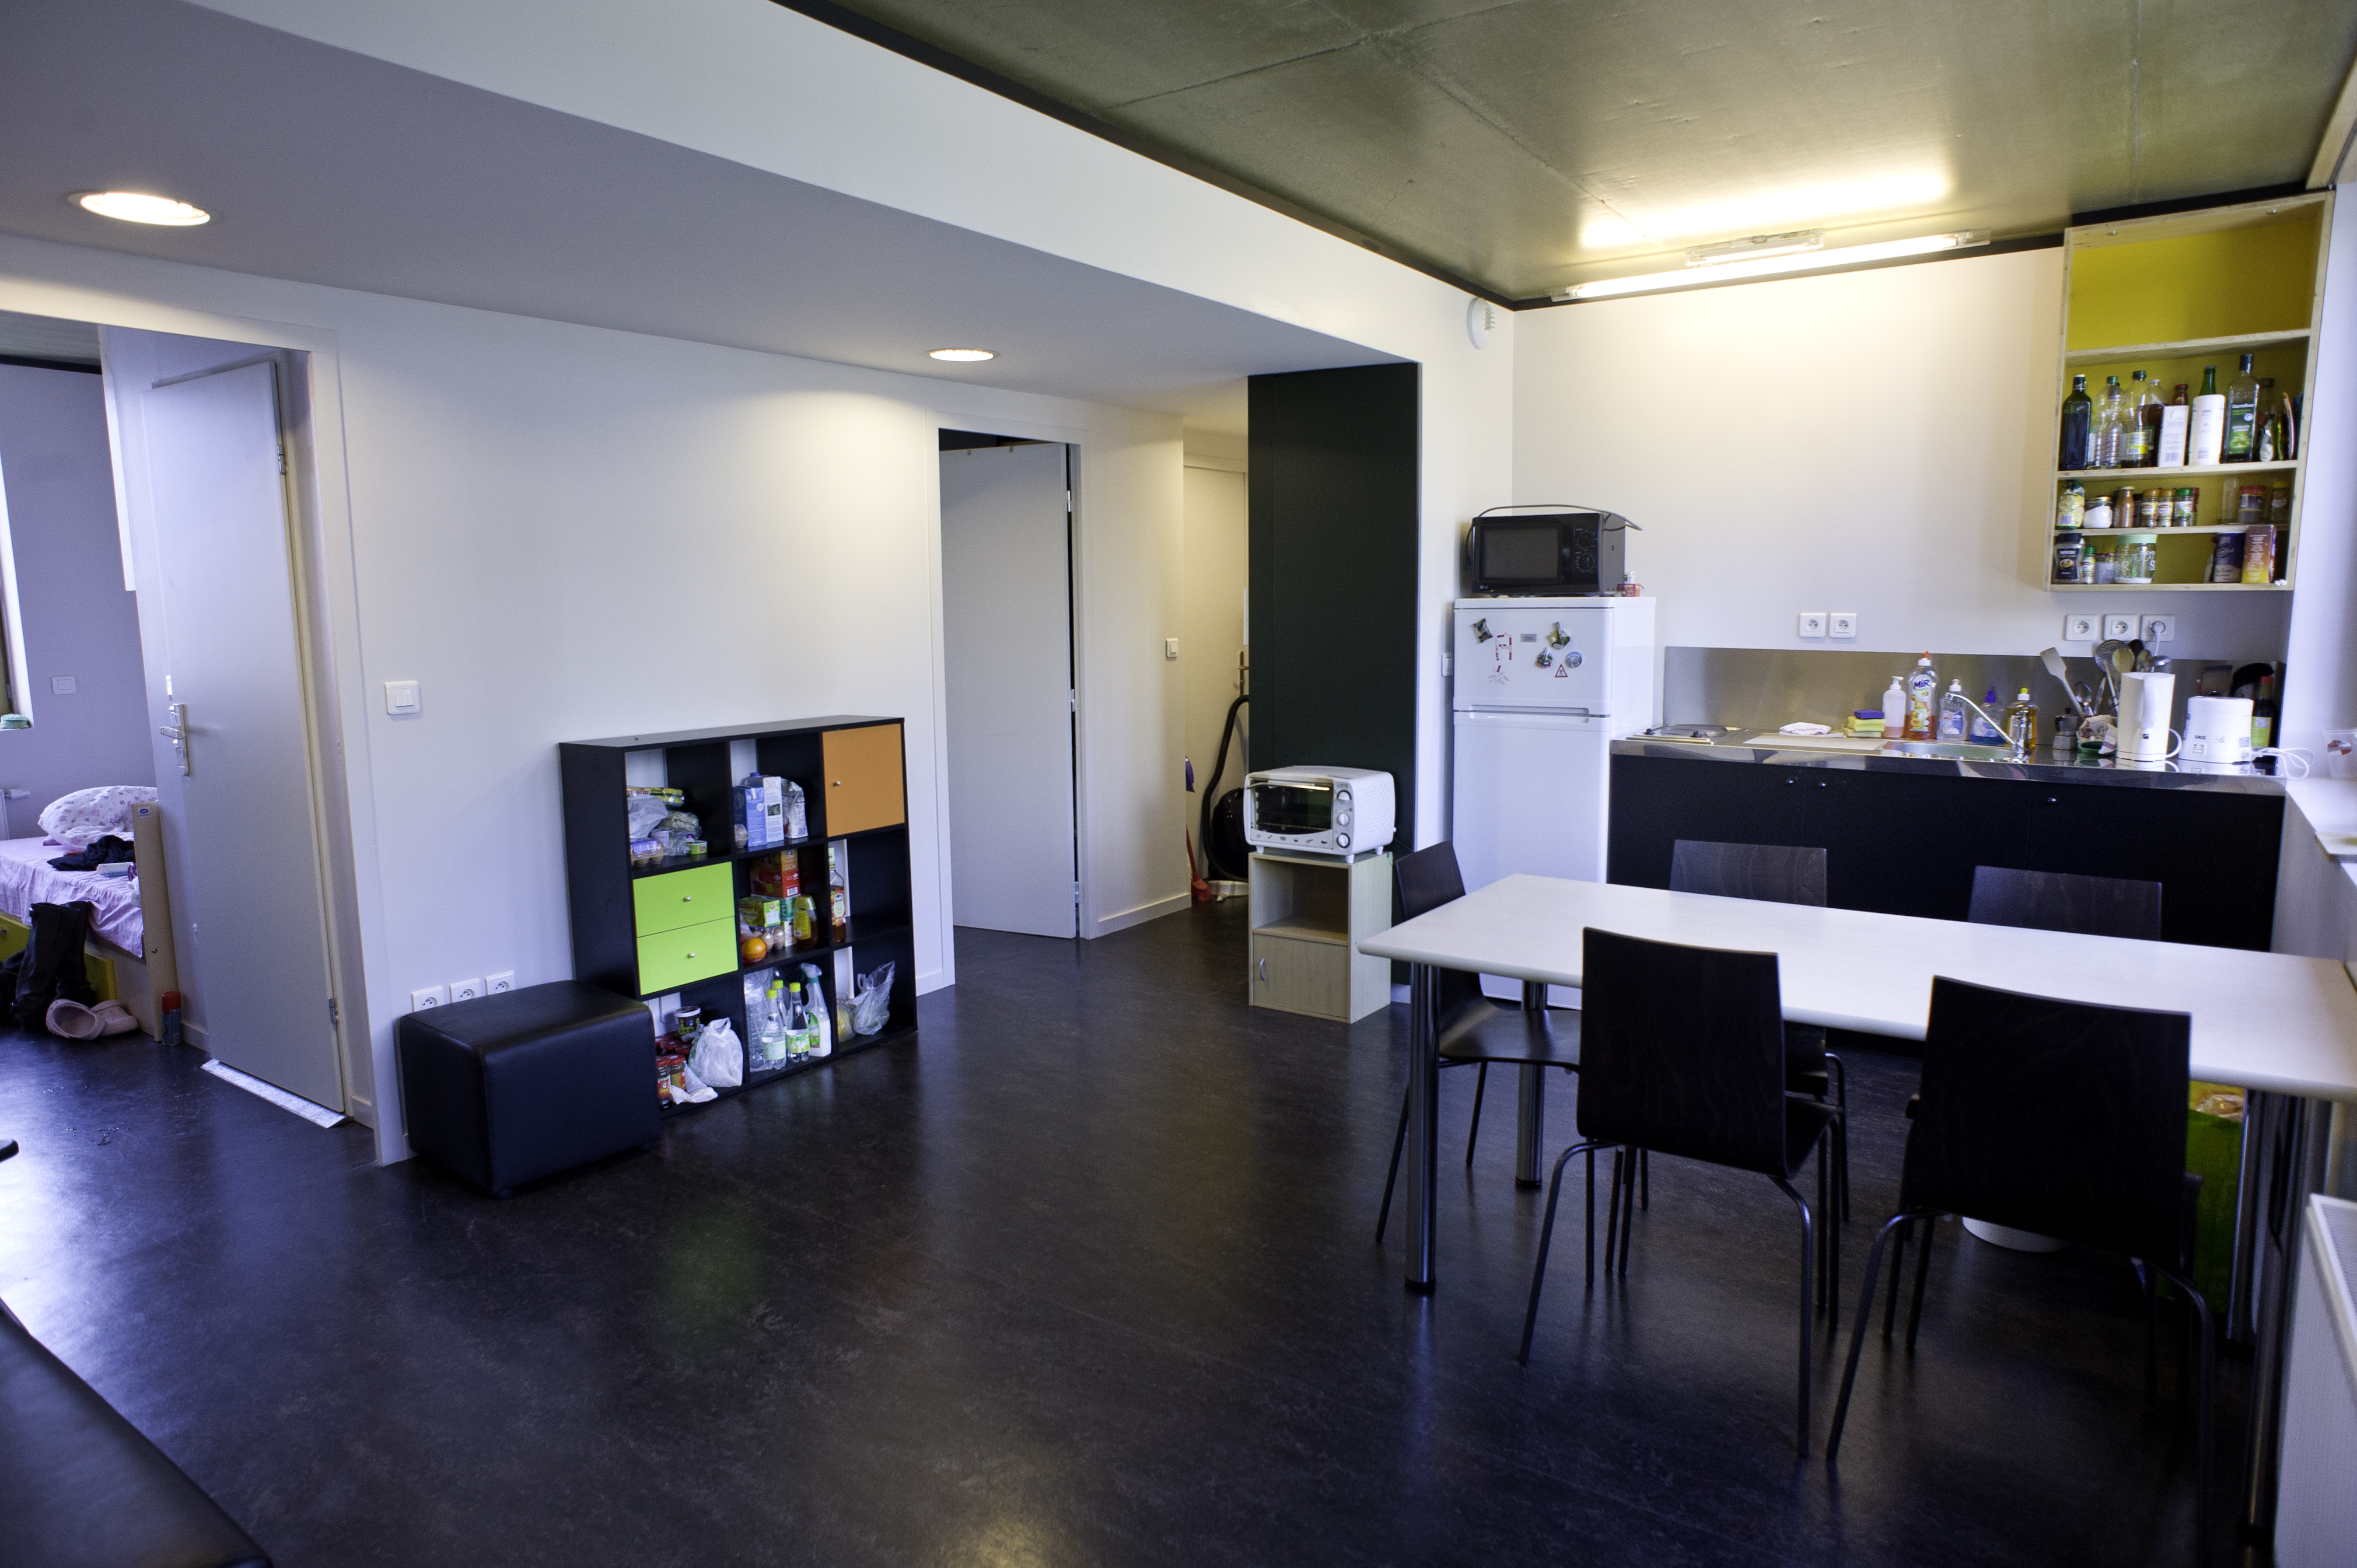 r sidence la cardini re crous grenoble alpes. Black Bedroom Furniture Sets. Home Design Ideas